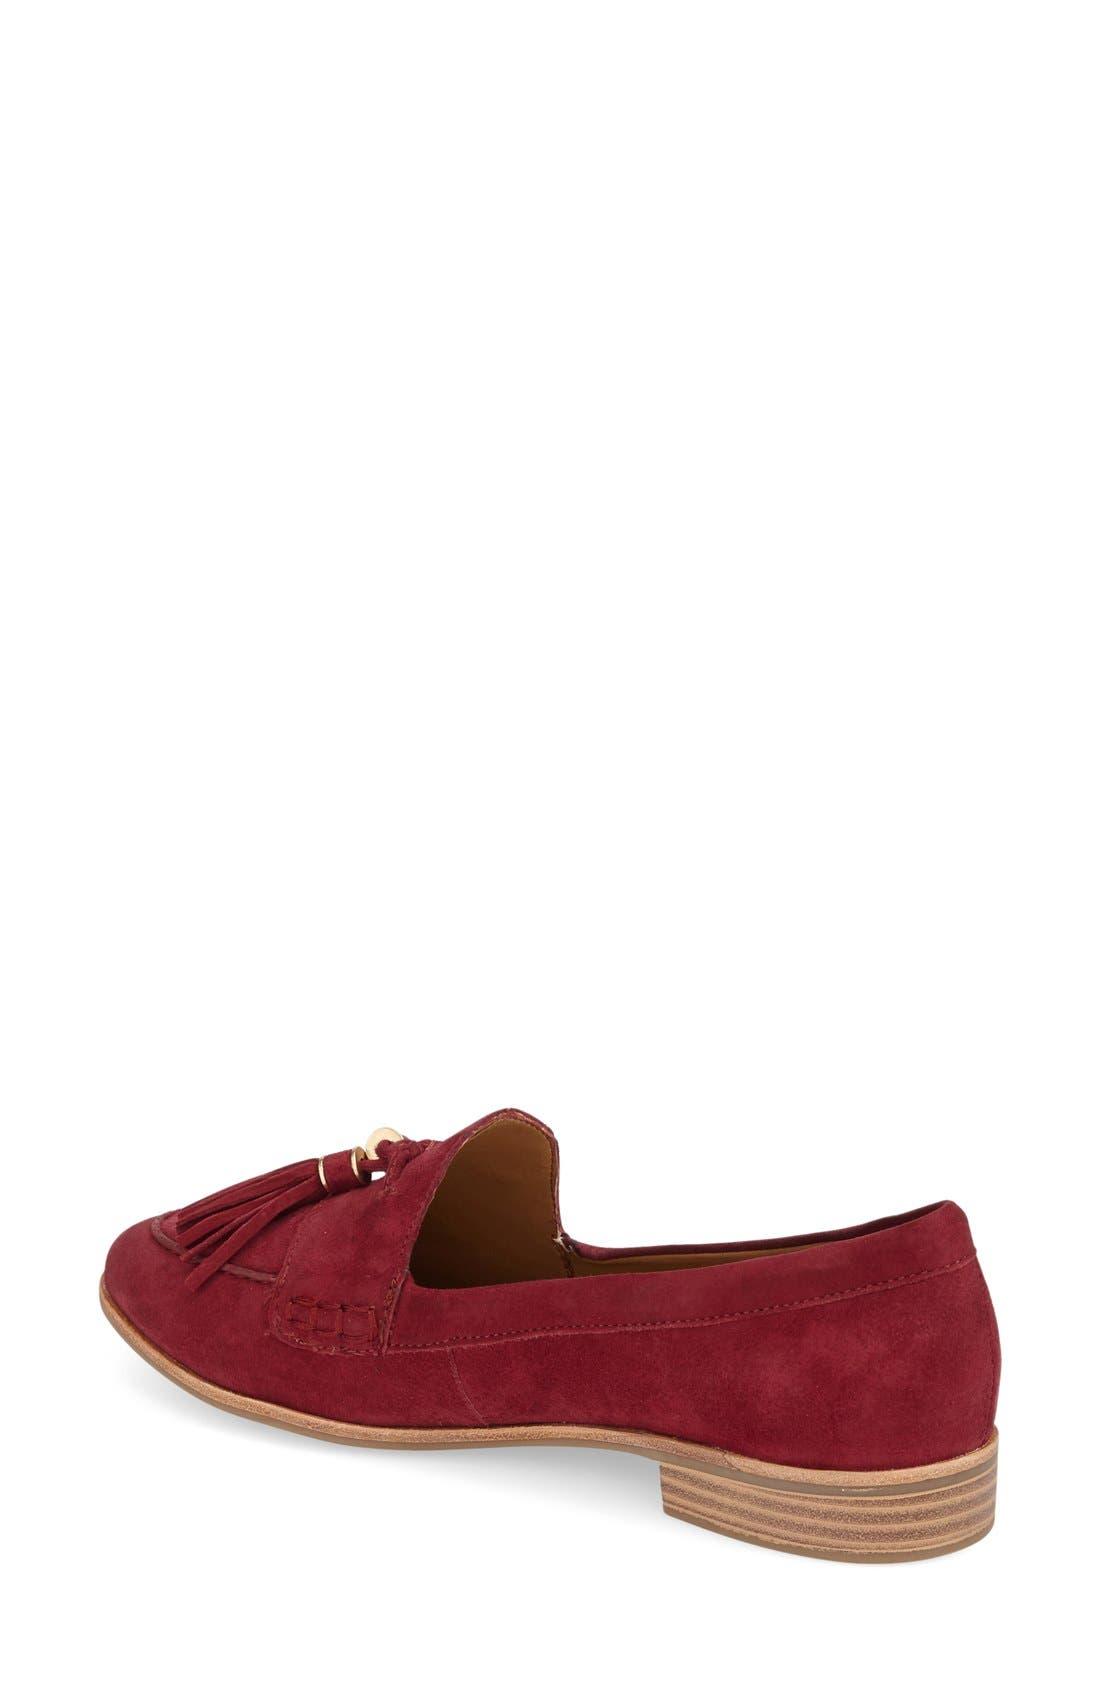 'Estelle' Tassel Loafer,                             Alternate thumbnail 2, color,                             Cherry Red Suede